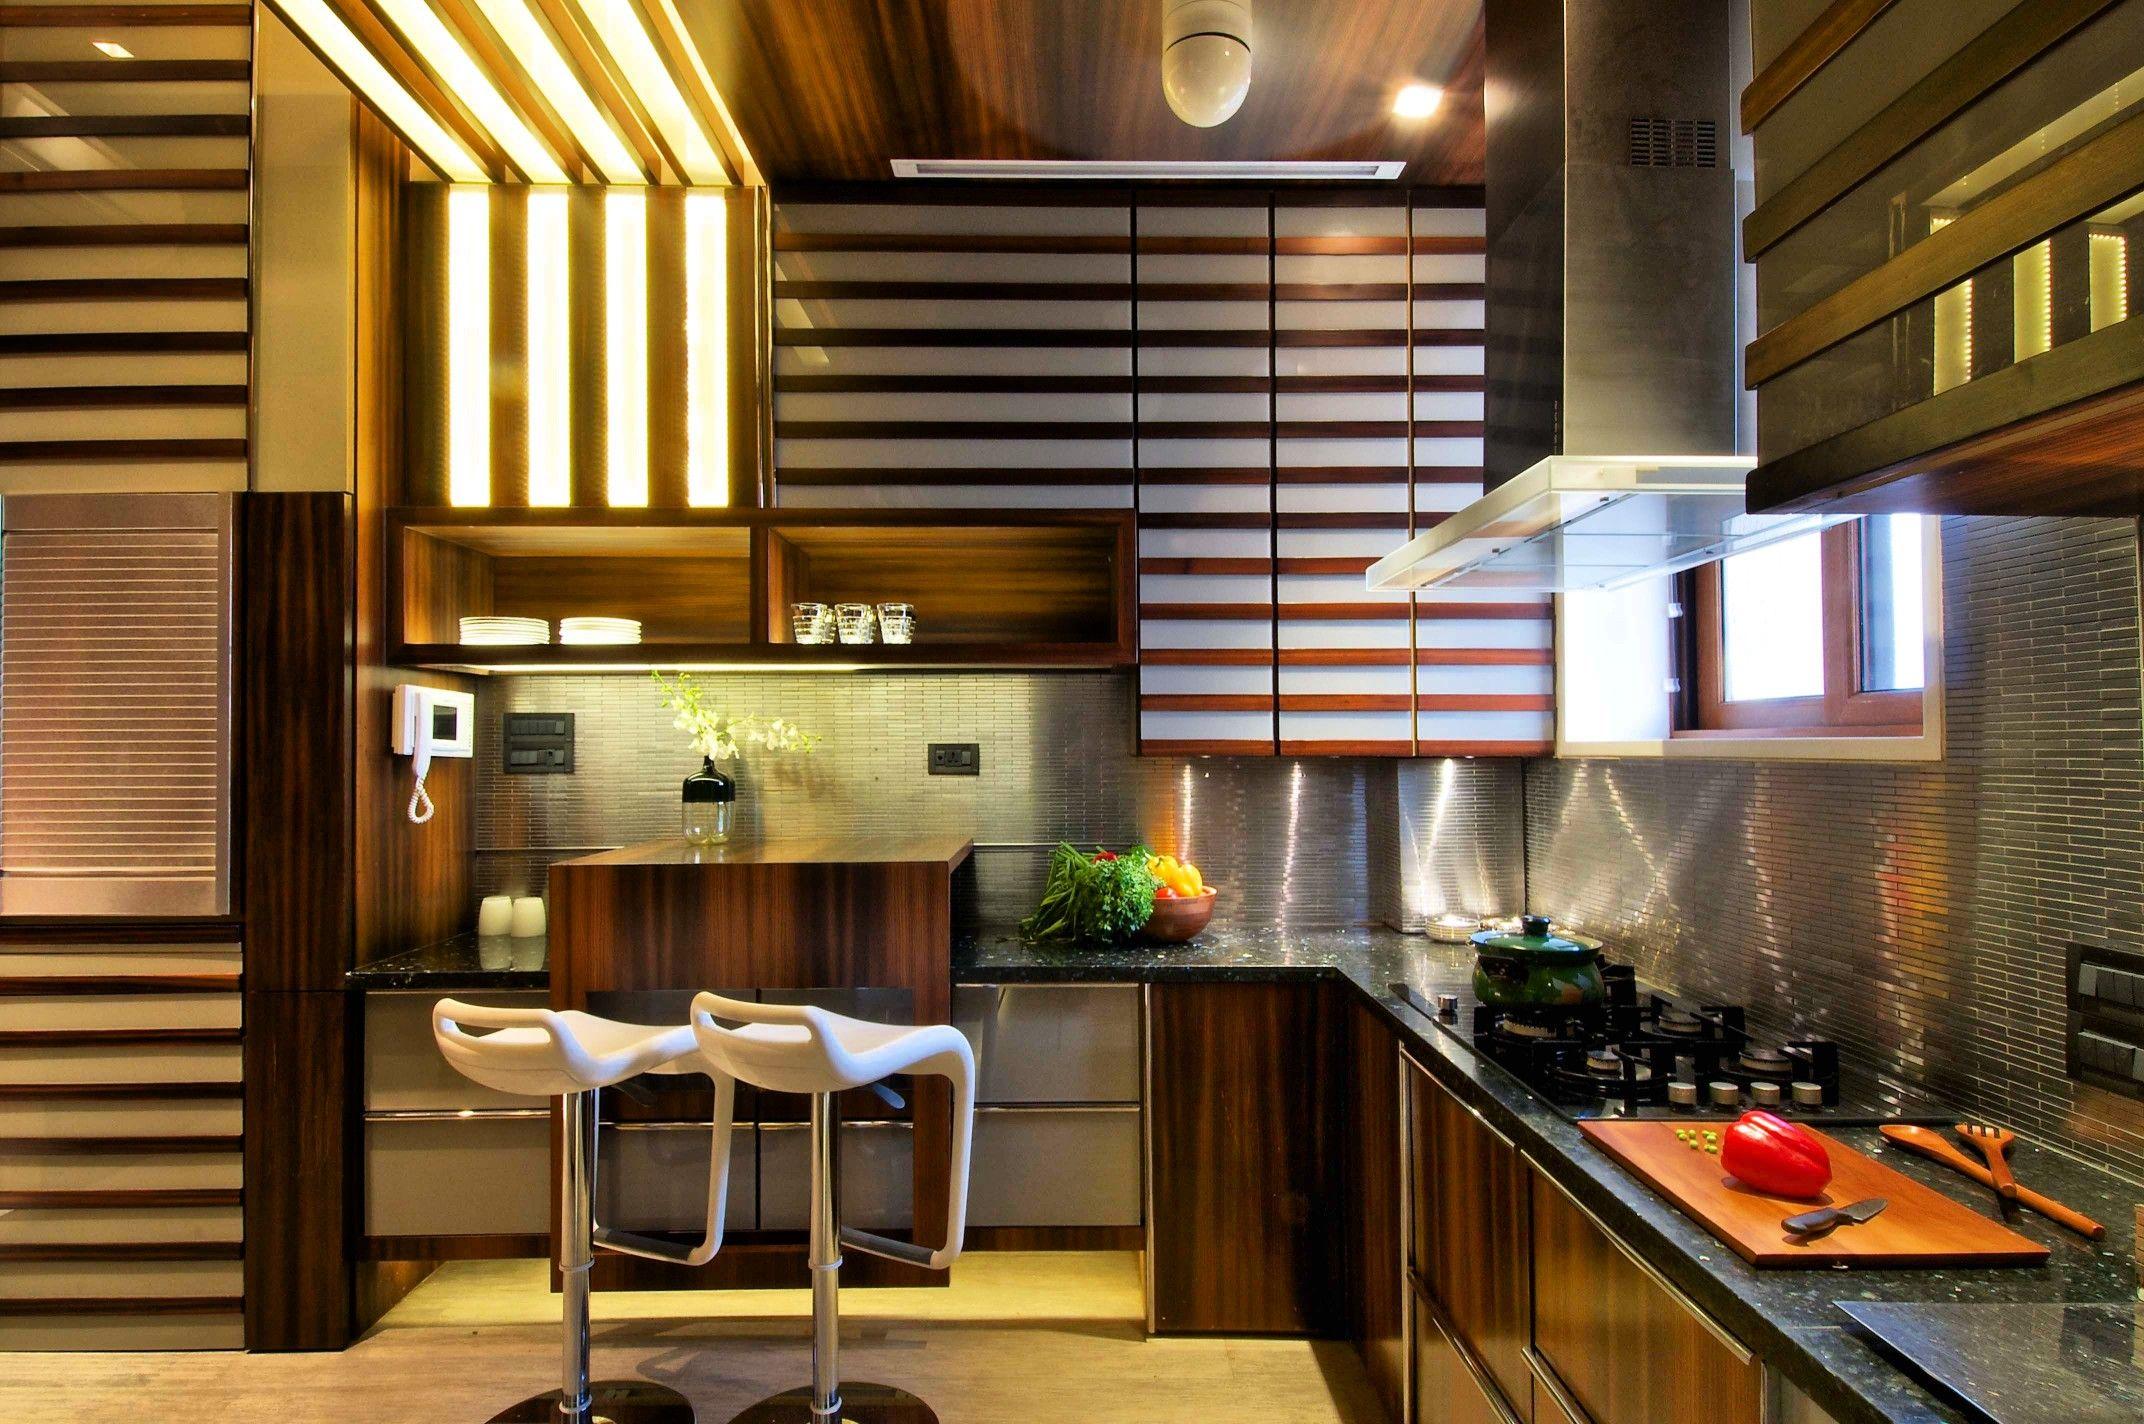 #stayathome #coordinated #visualsoflife #interiordesigntips #interiør #howwedwell #interiordesign #luxuryinteriors #inmydomaine #interior4you #interiorinspo #instadaily #designinterior #interiordesigner #thecreatorclass #designattractor #interiorgoals #instagood #design #designinspiration #instadesign #kns_architects #architecture_greatshots #archidaily #mumbai